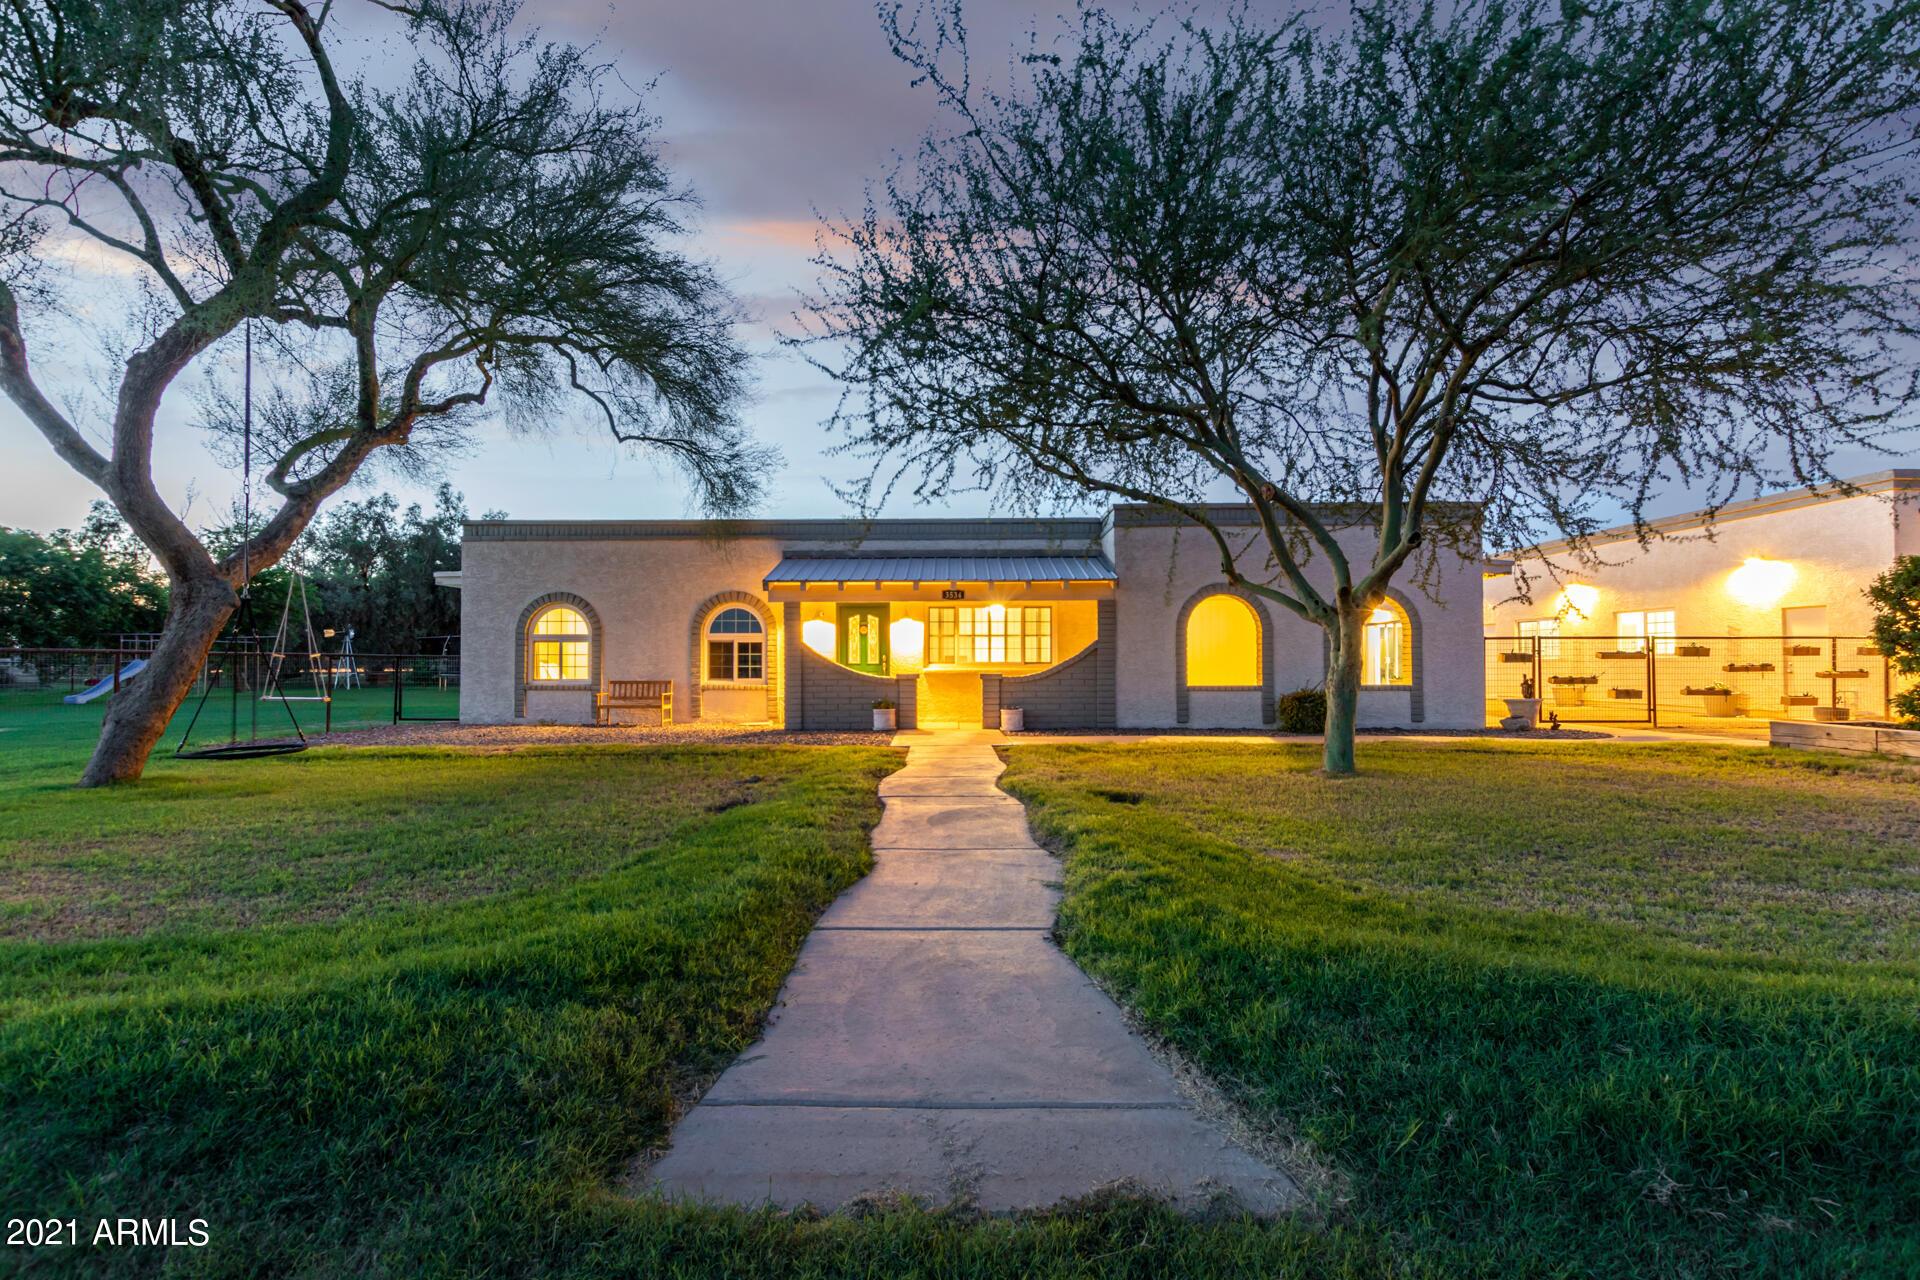 3534 BARBARITA Avenue, Gilbert, Arizona 85234, 4 Bedrooms Bedrooms, ,3 BathroomsBathrooms,Residential,For Sale,BARBARITA,6278589